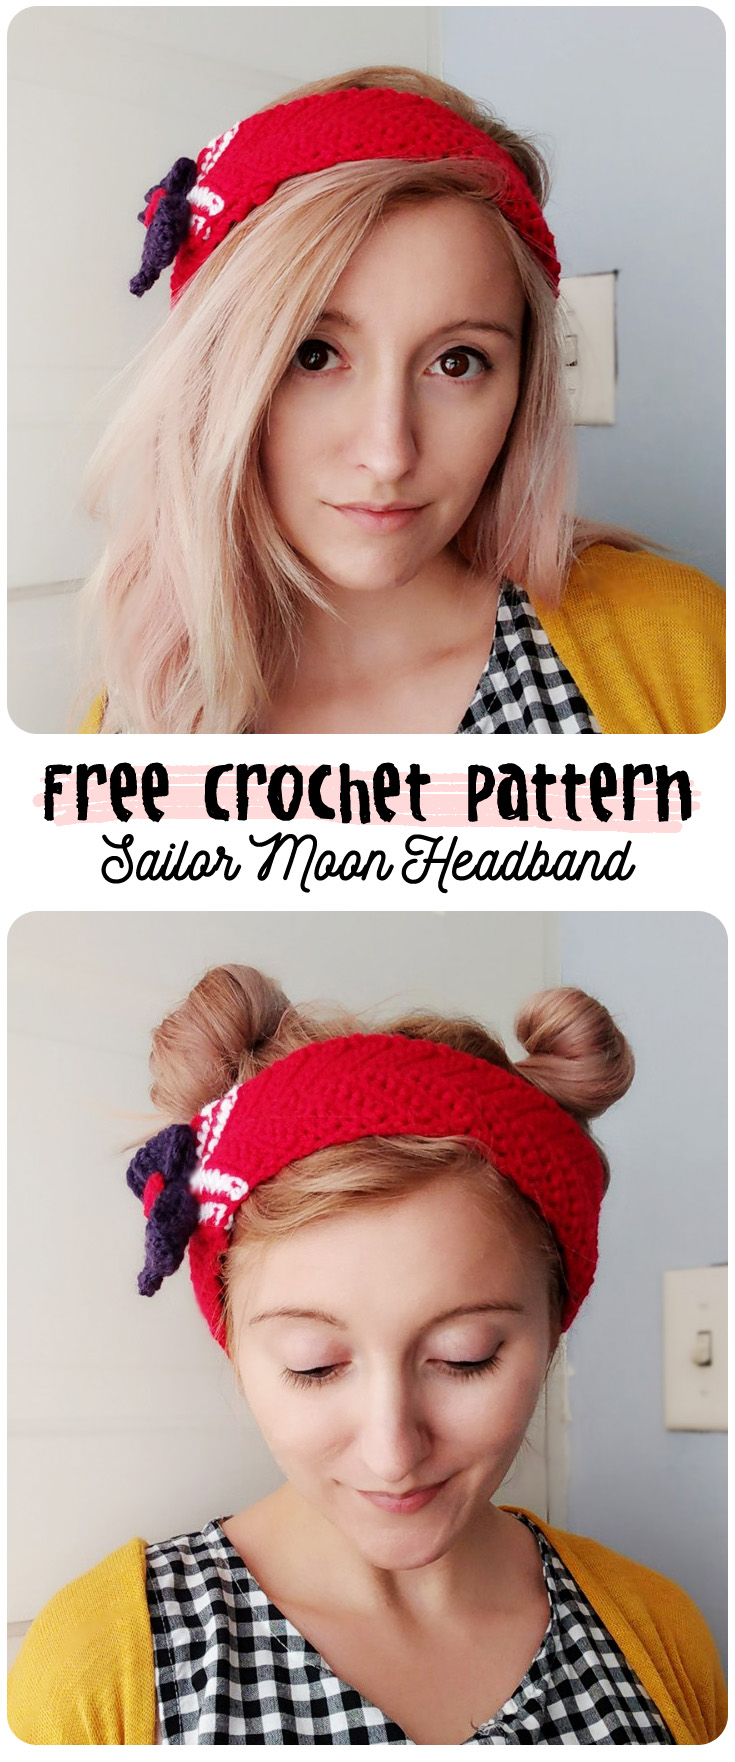 free-crochet-pattern-sailor-moon-headband (8).jpg